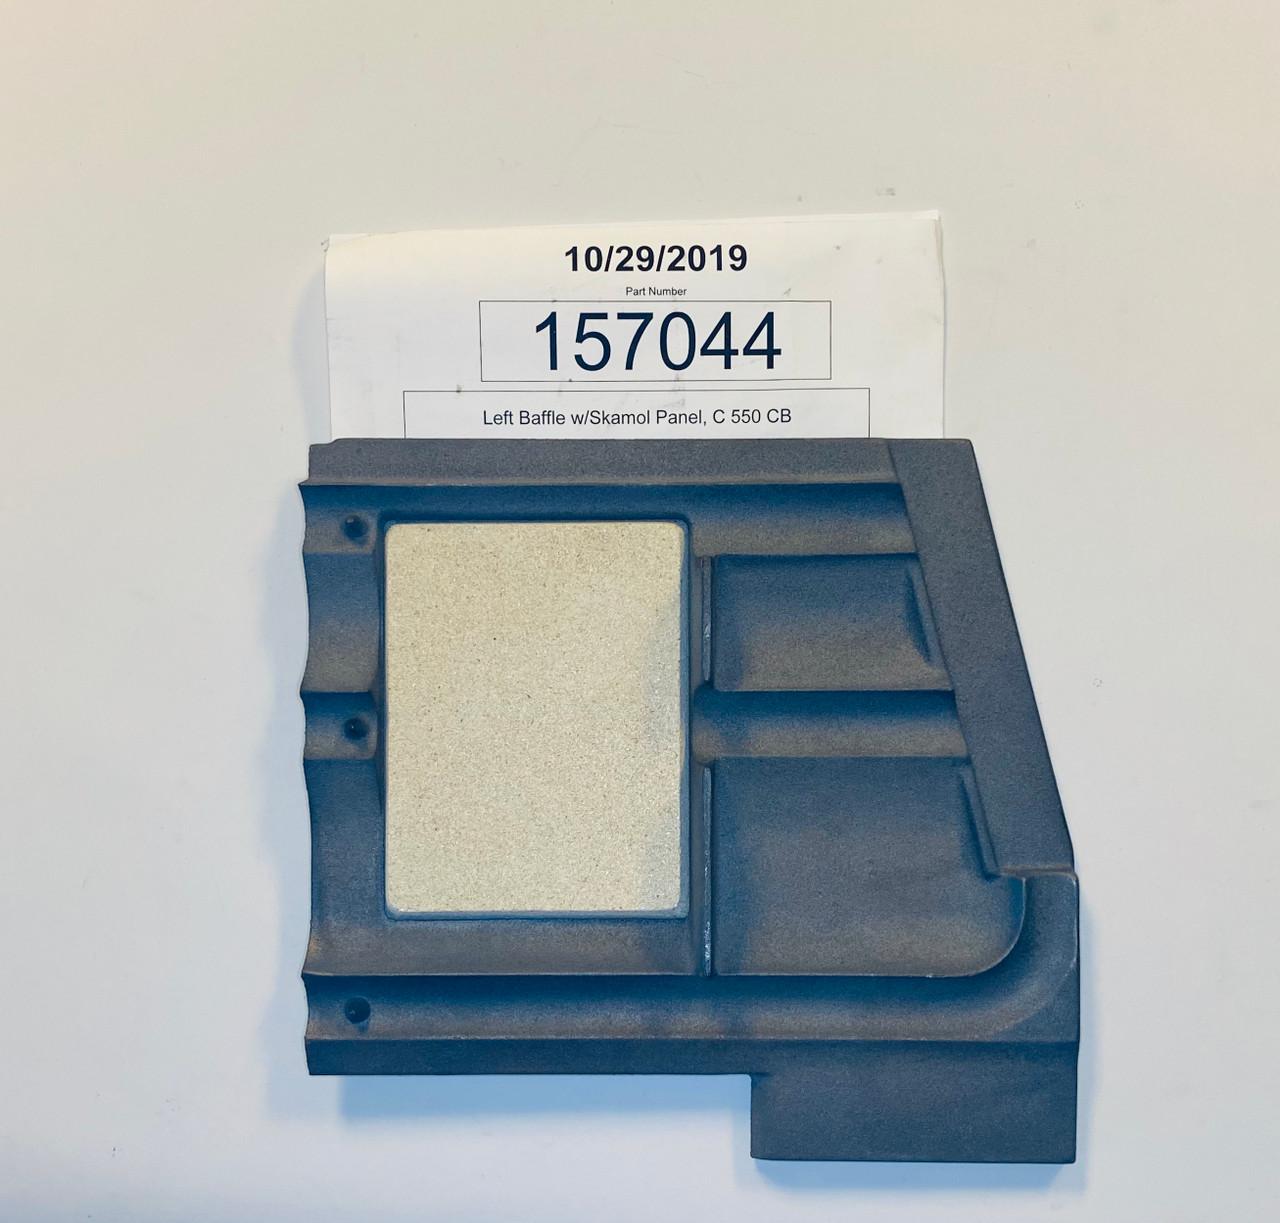 Jotul C550 LH Baffle Plate 157044  bottom side